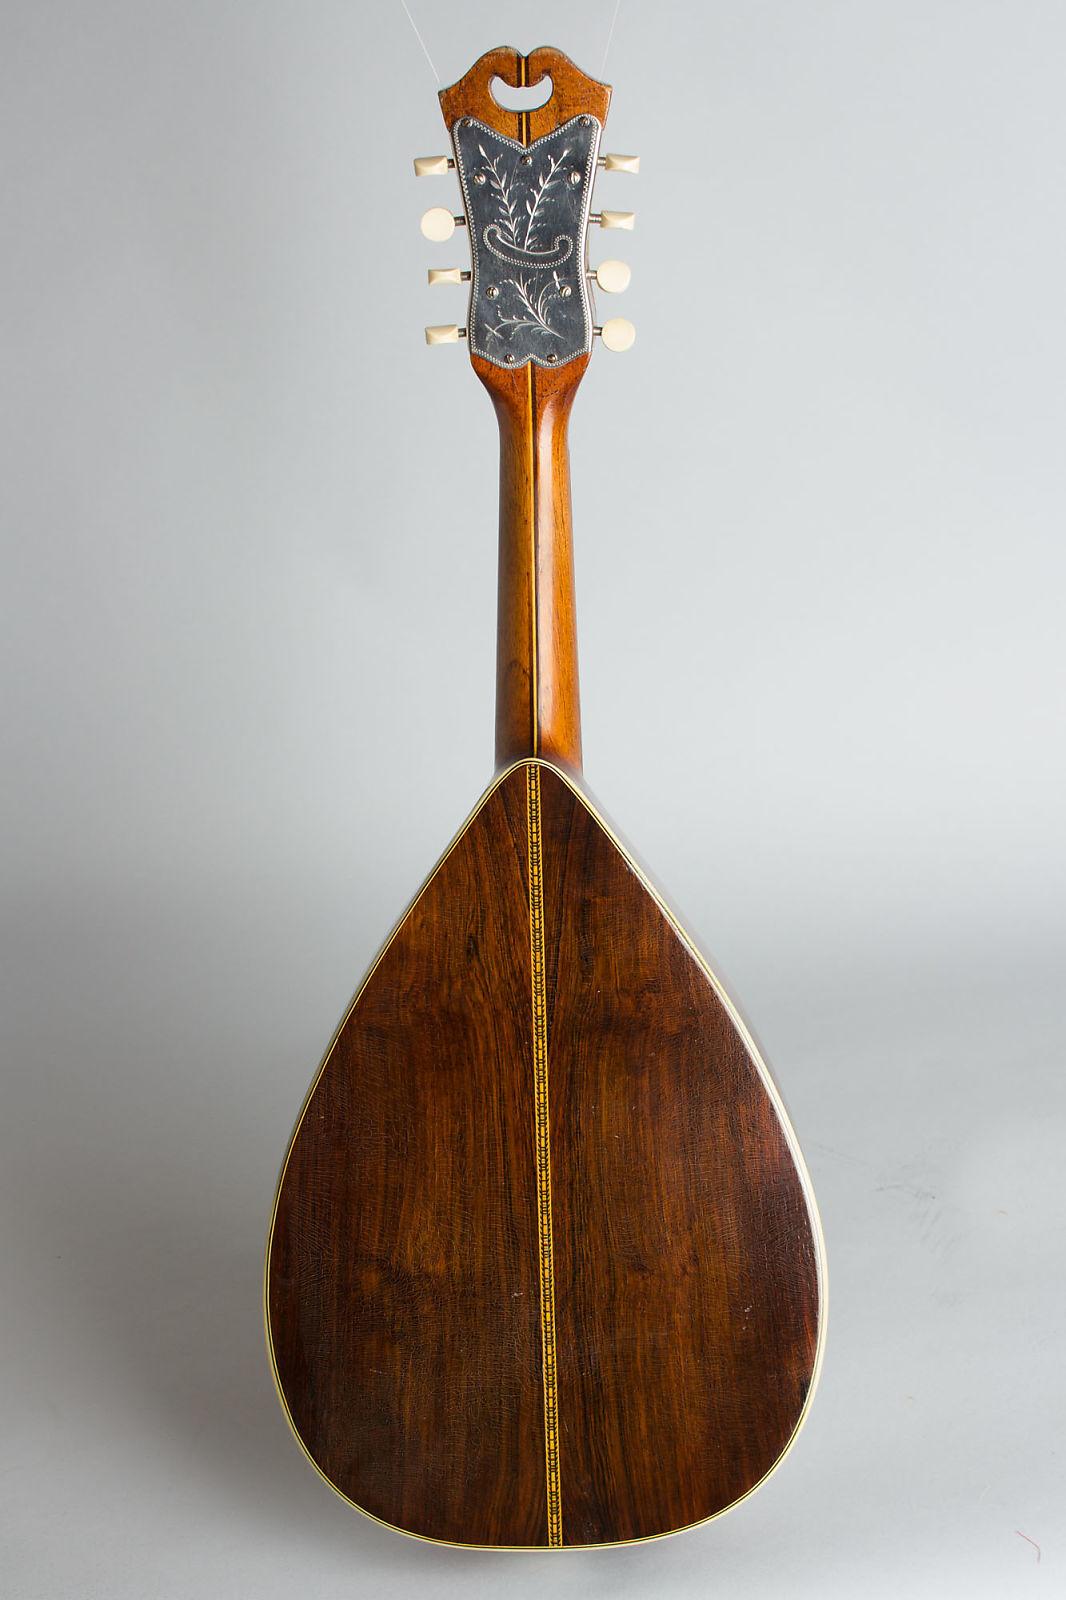 Stahl Flat Back, Bent Top Mandolin, made by Larson Brothers,  c. 1917, ser. #25853, black chipboard case.